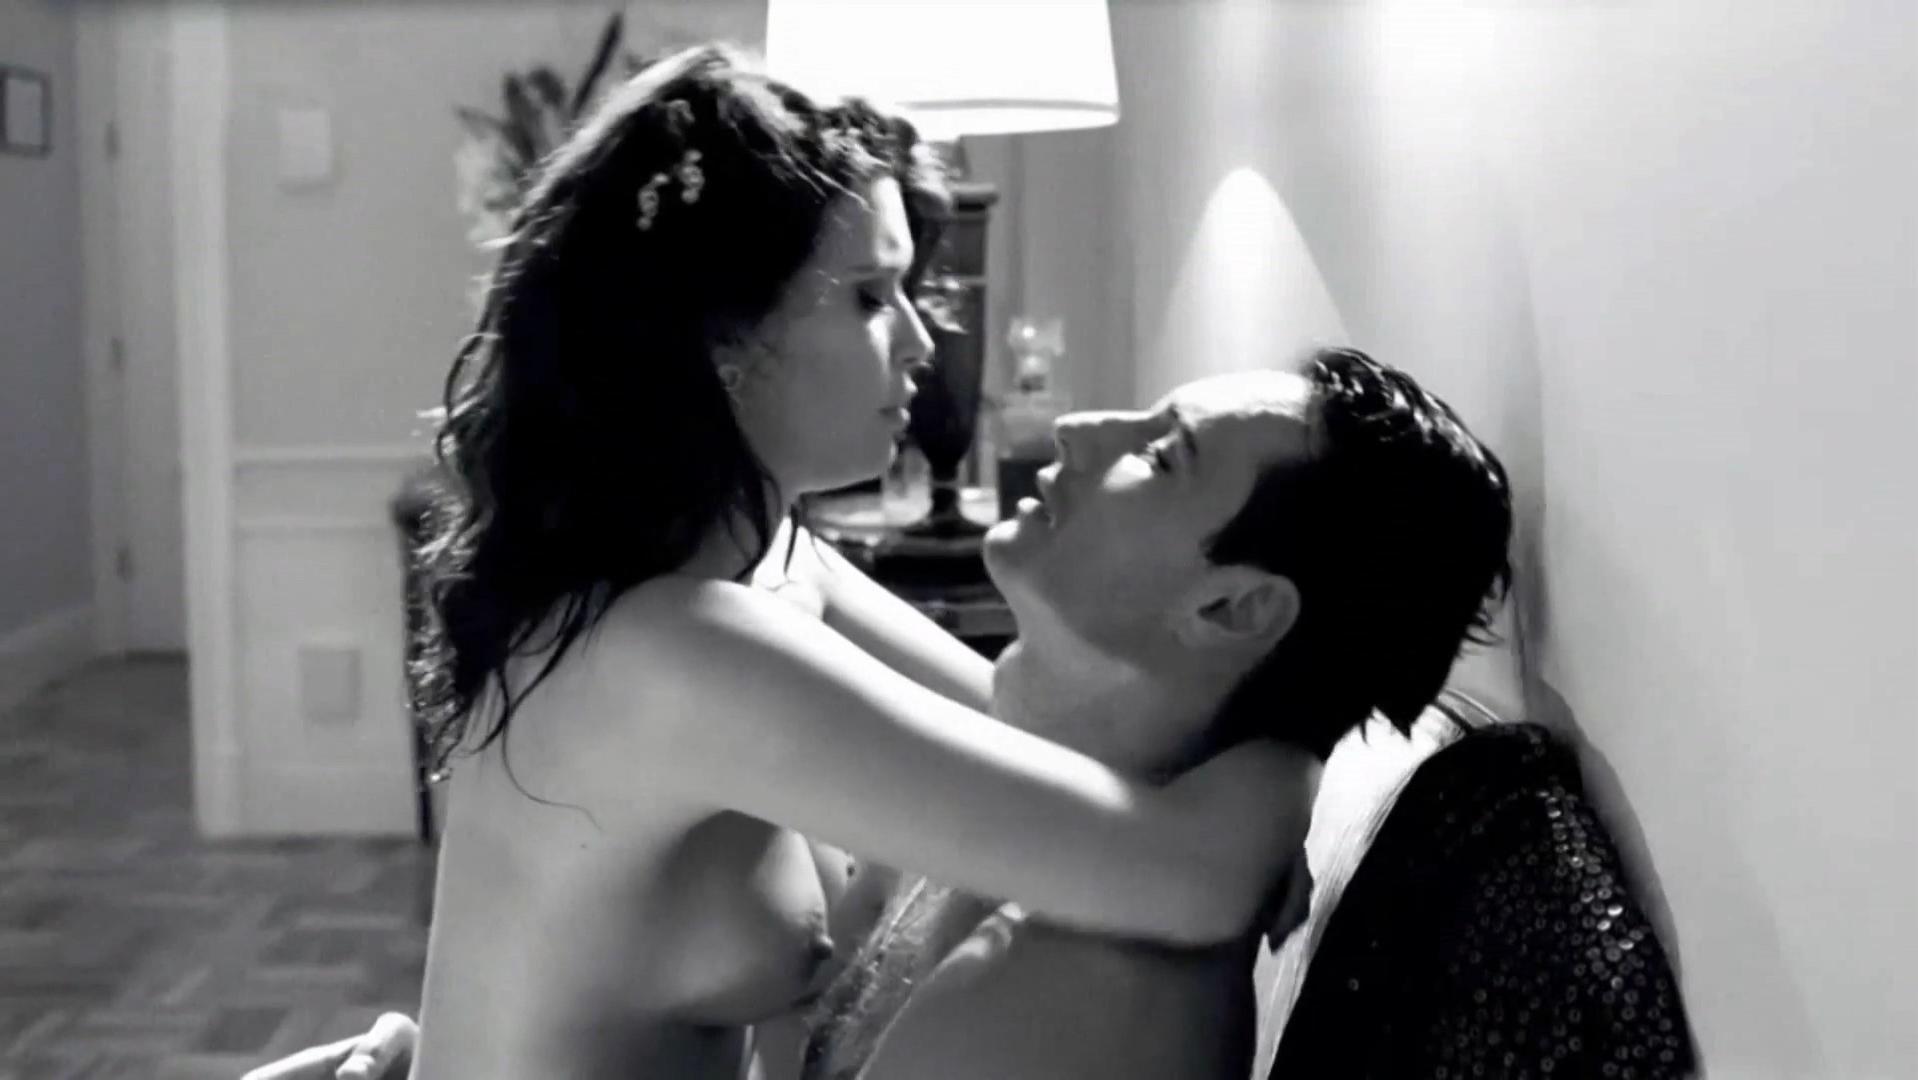 Angie Cepeda nude - Heleno (2011)